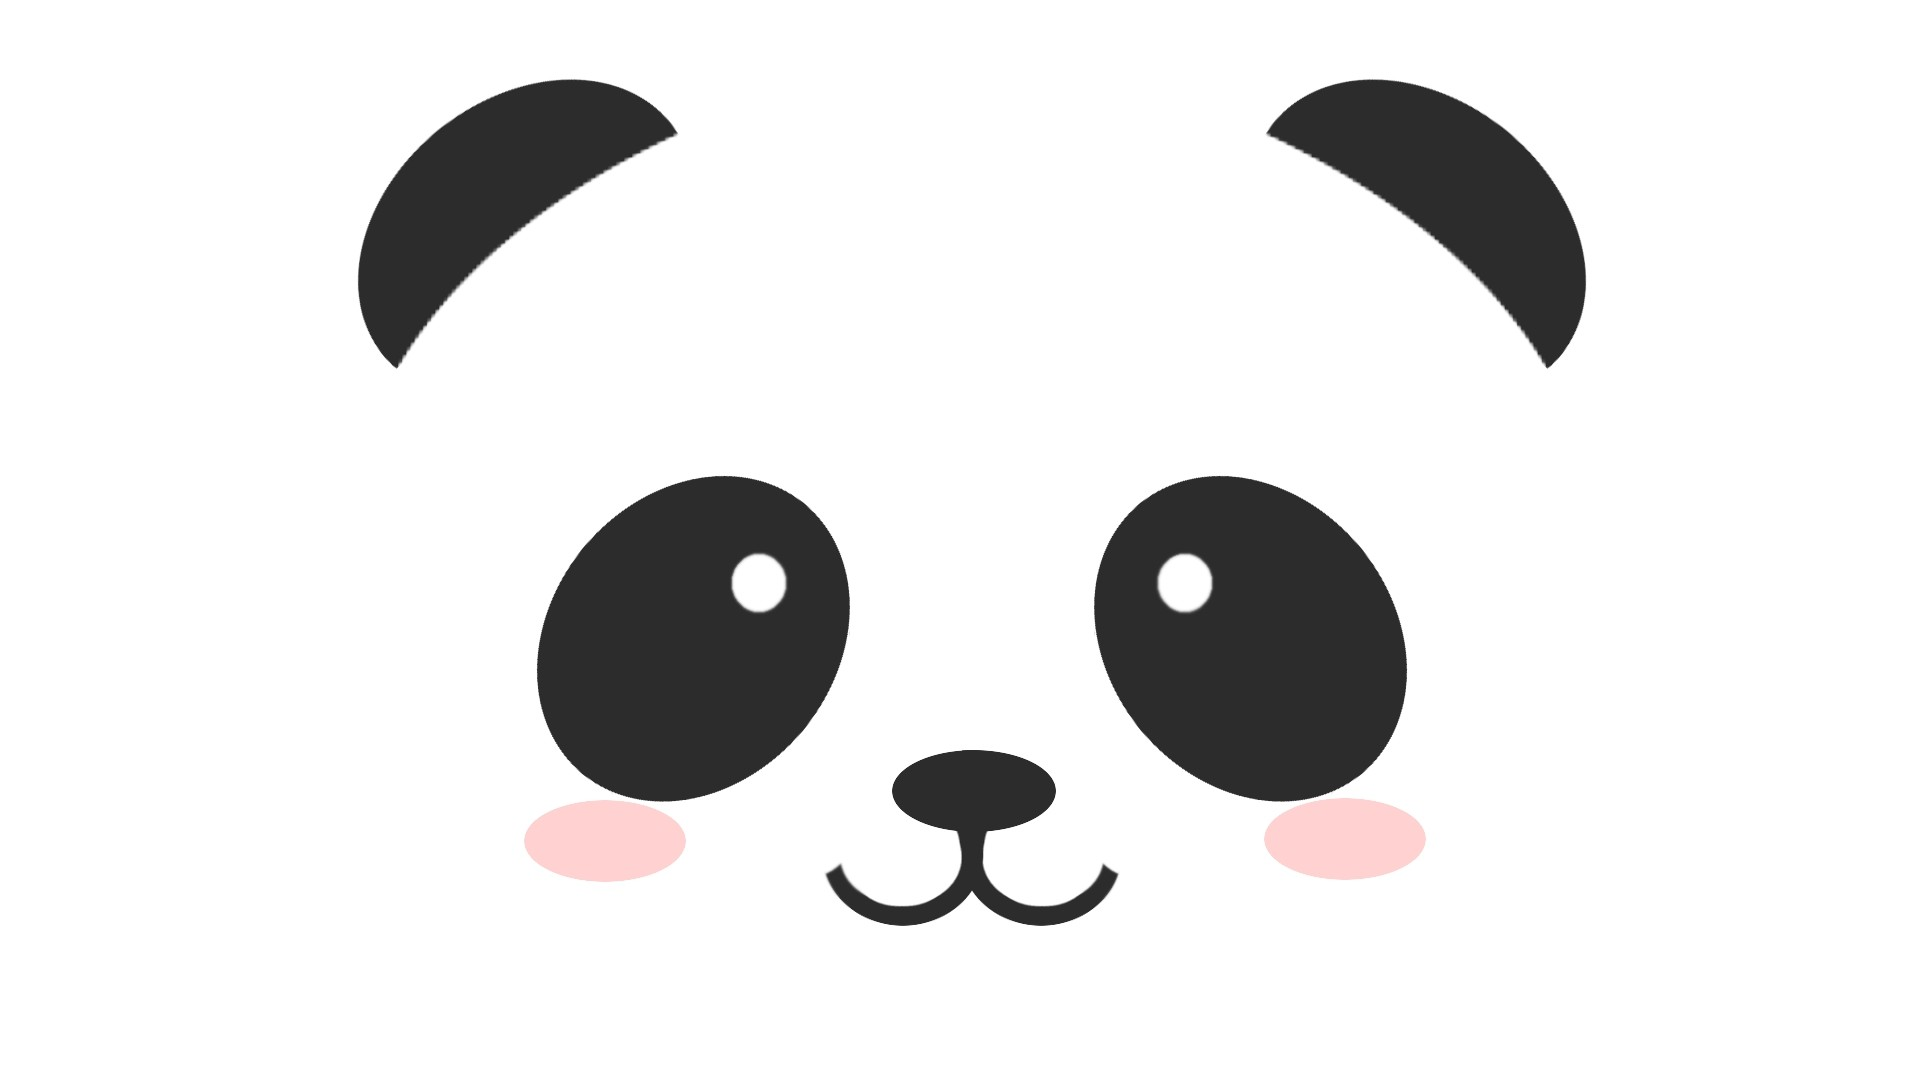 Panda Wallpaper For Computer 57 Images